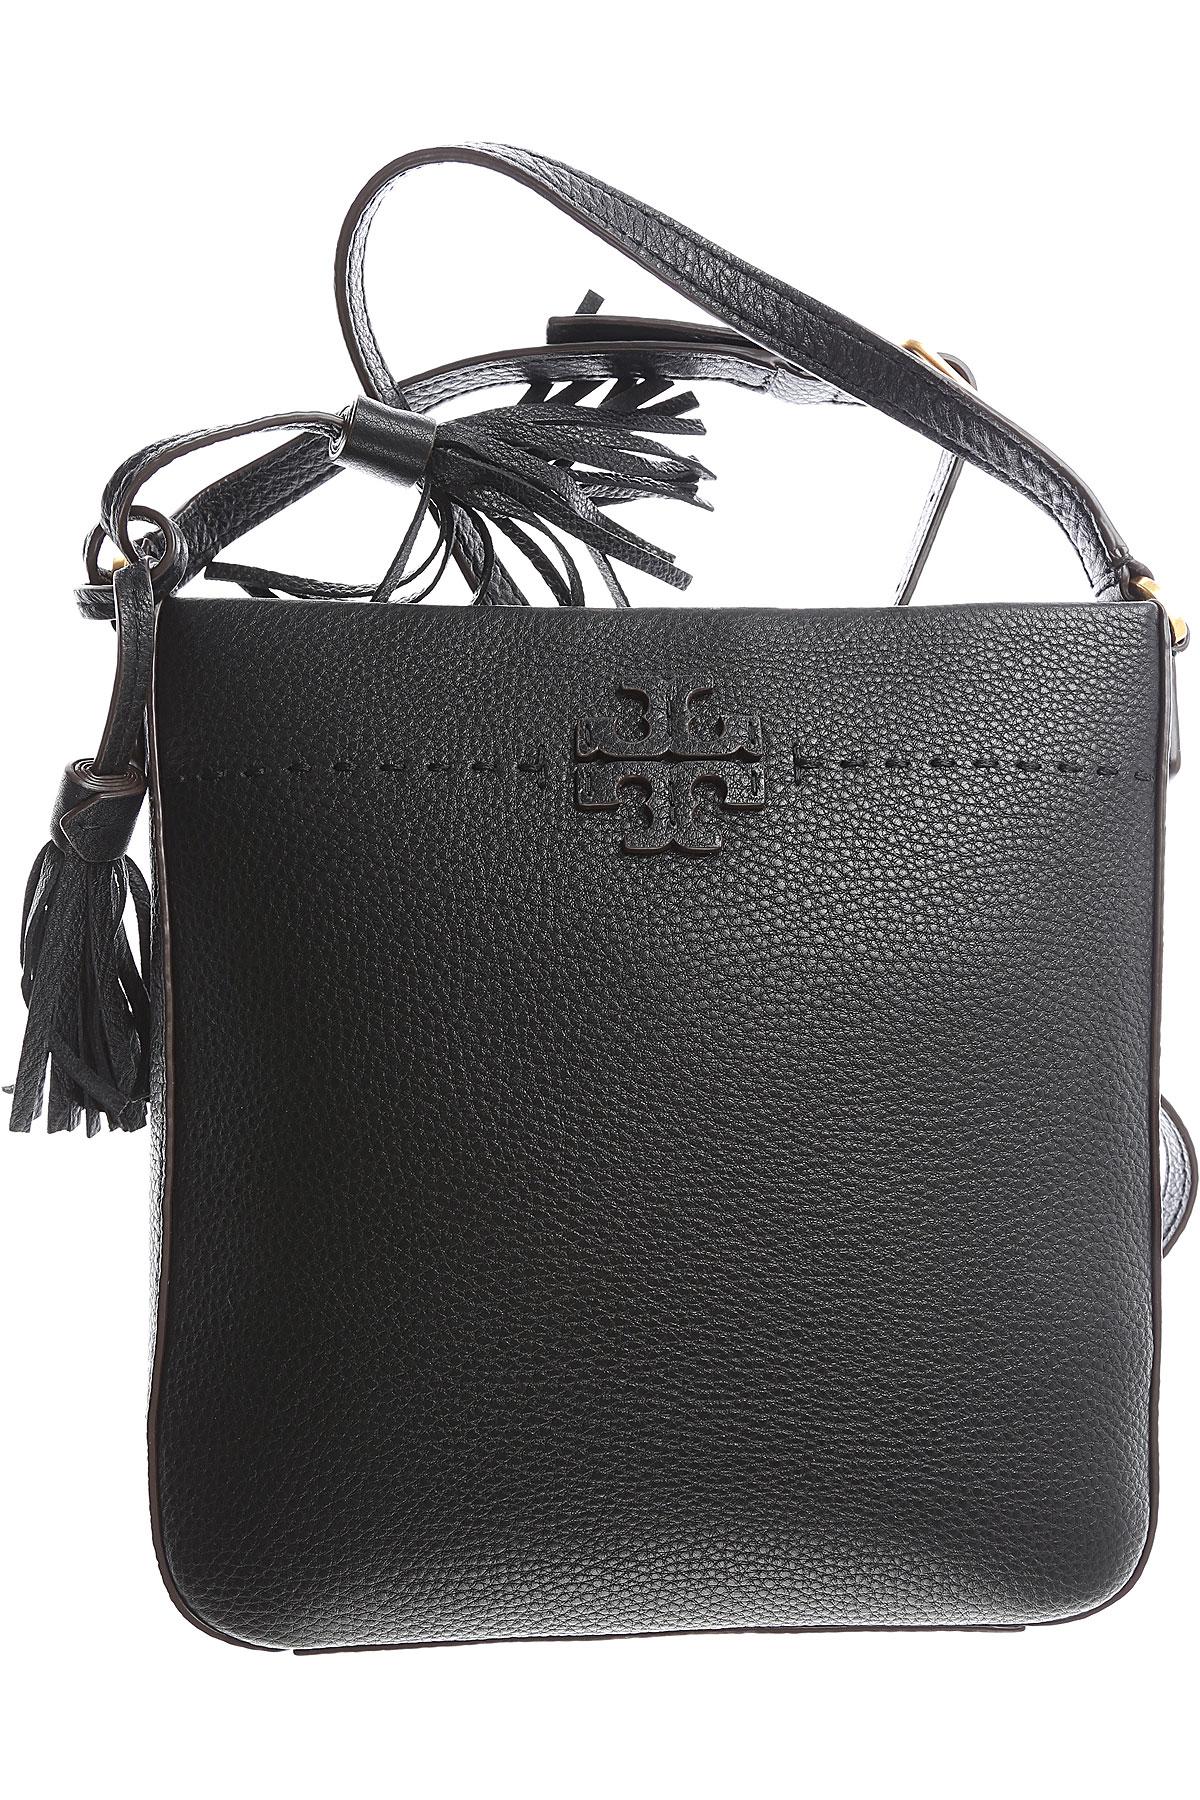 Tory Burch Shoulder Bag for Women On Sale, Black, Leather, 2017 USA-449413